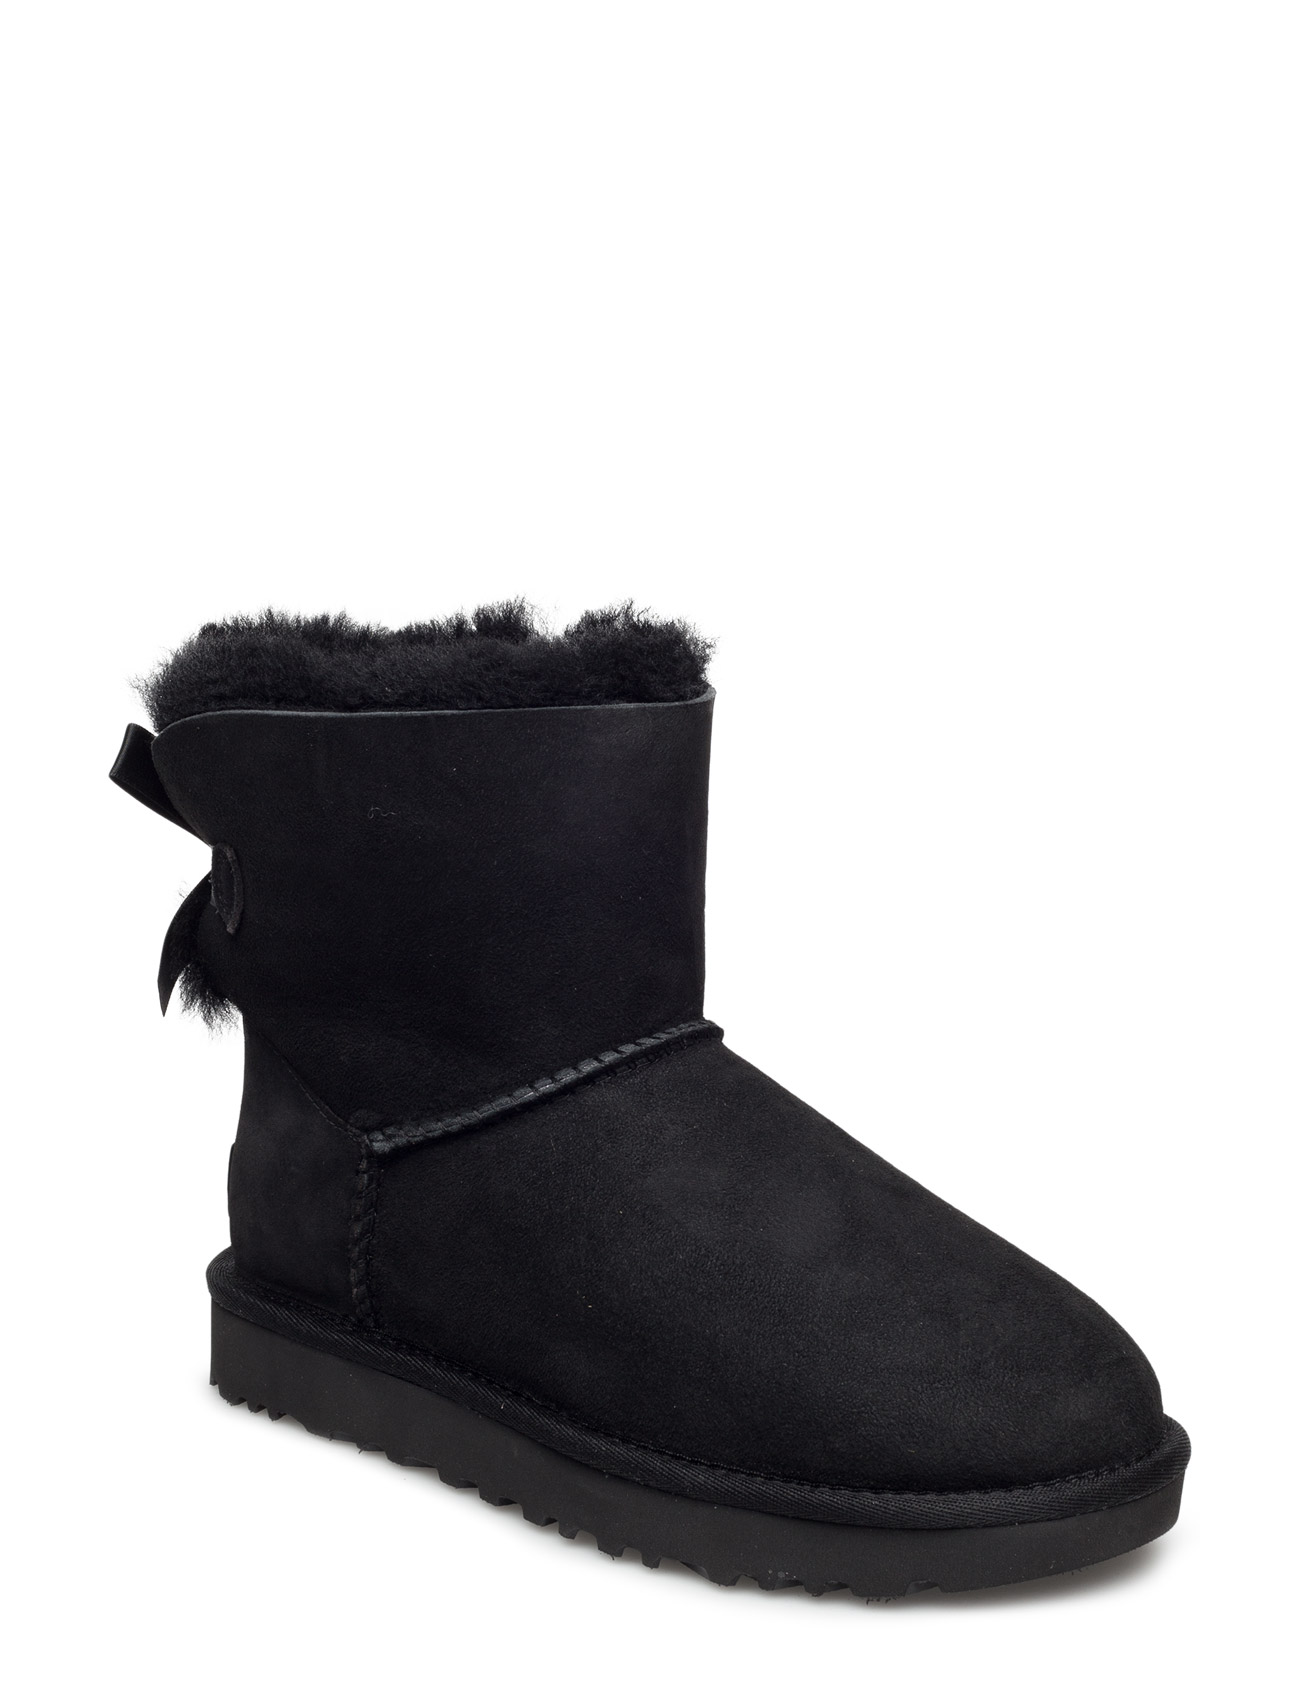 e2a5f56e1b68 Sort UGG W Mini Bailey Bow Ii vinterstøvler for dame - Pashion.dk